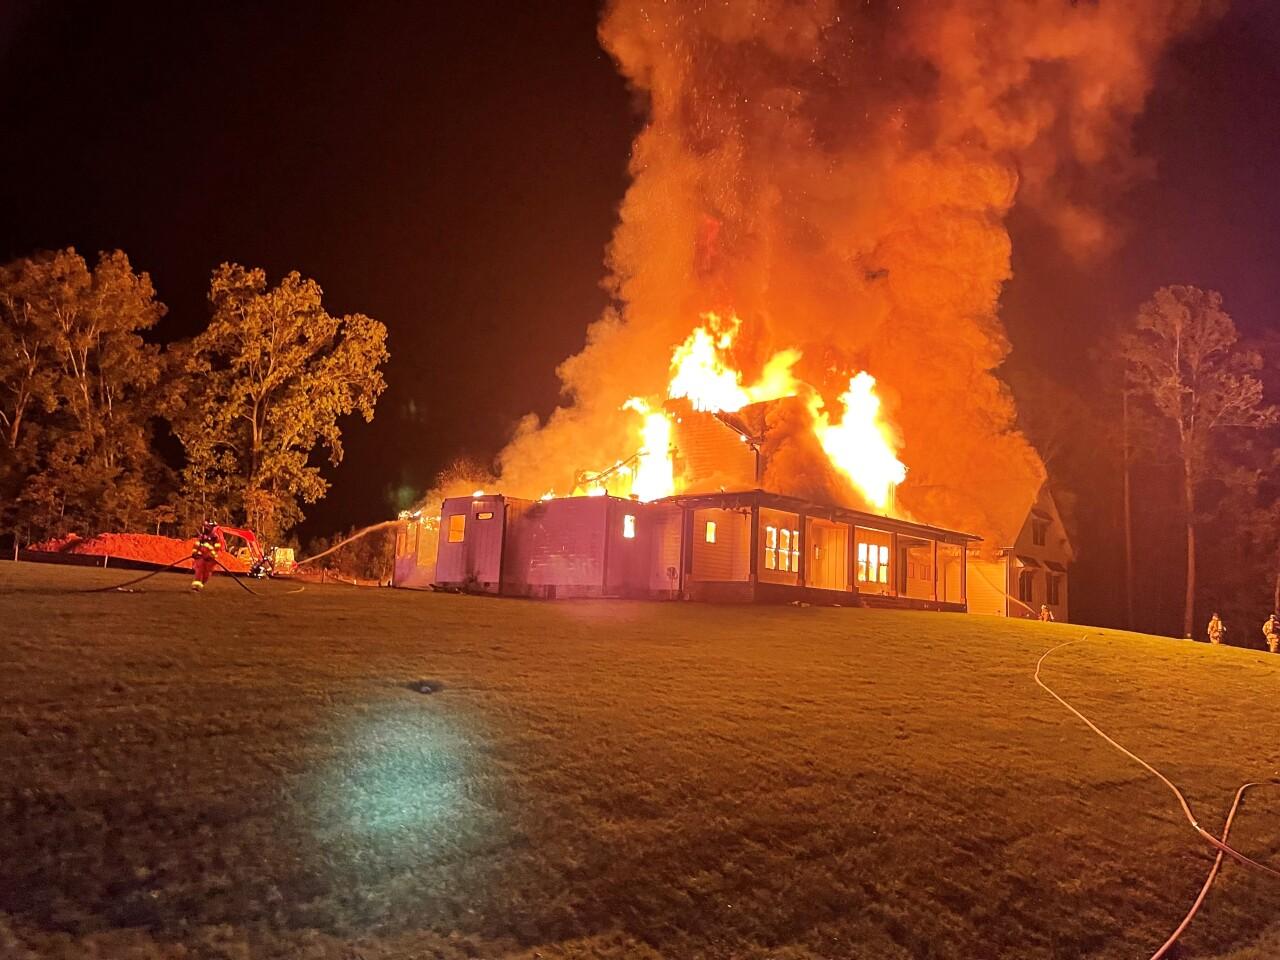 Goochland County Fire Rescue - Dover Branch Lane House Fire - October 8 2021 - 001.jpg